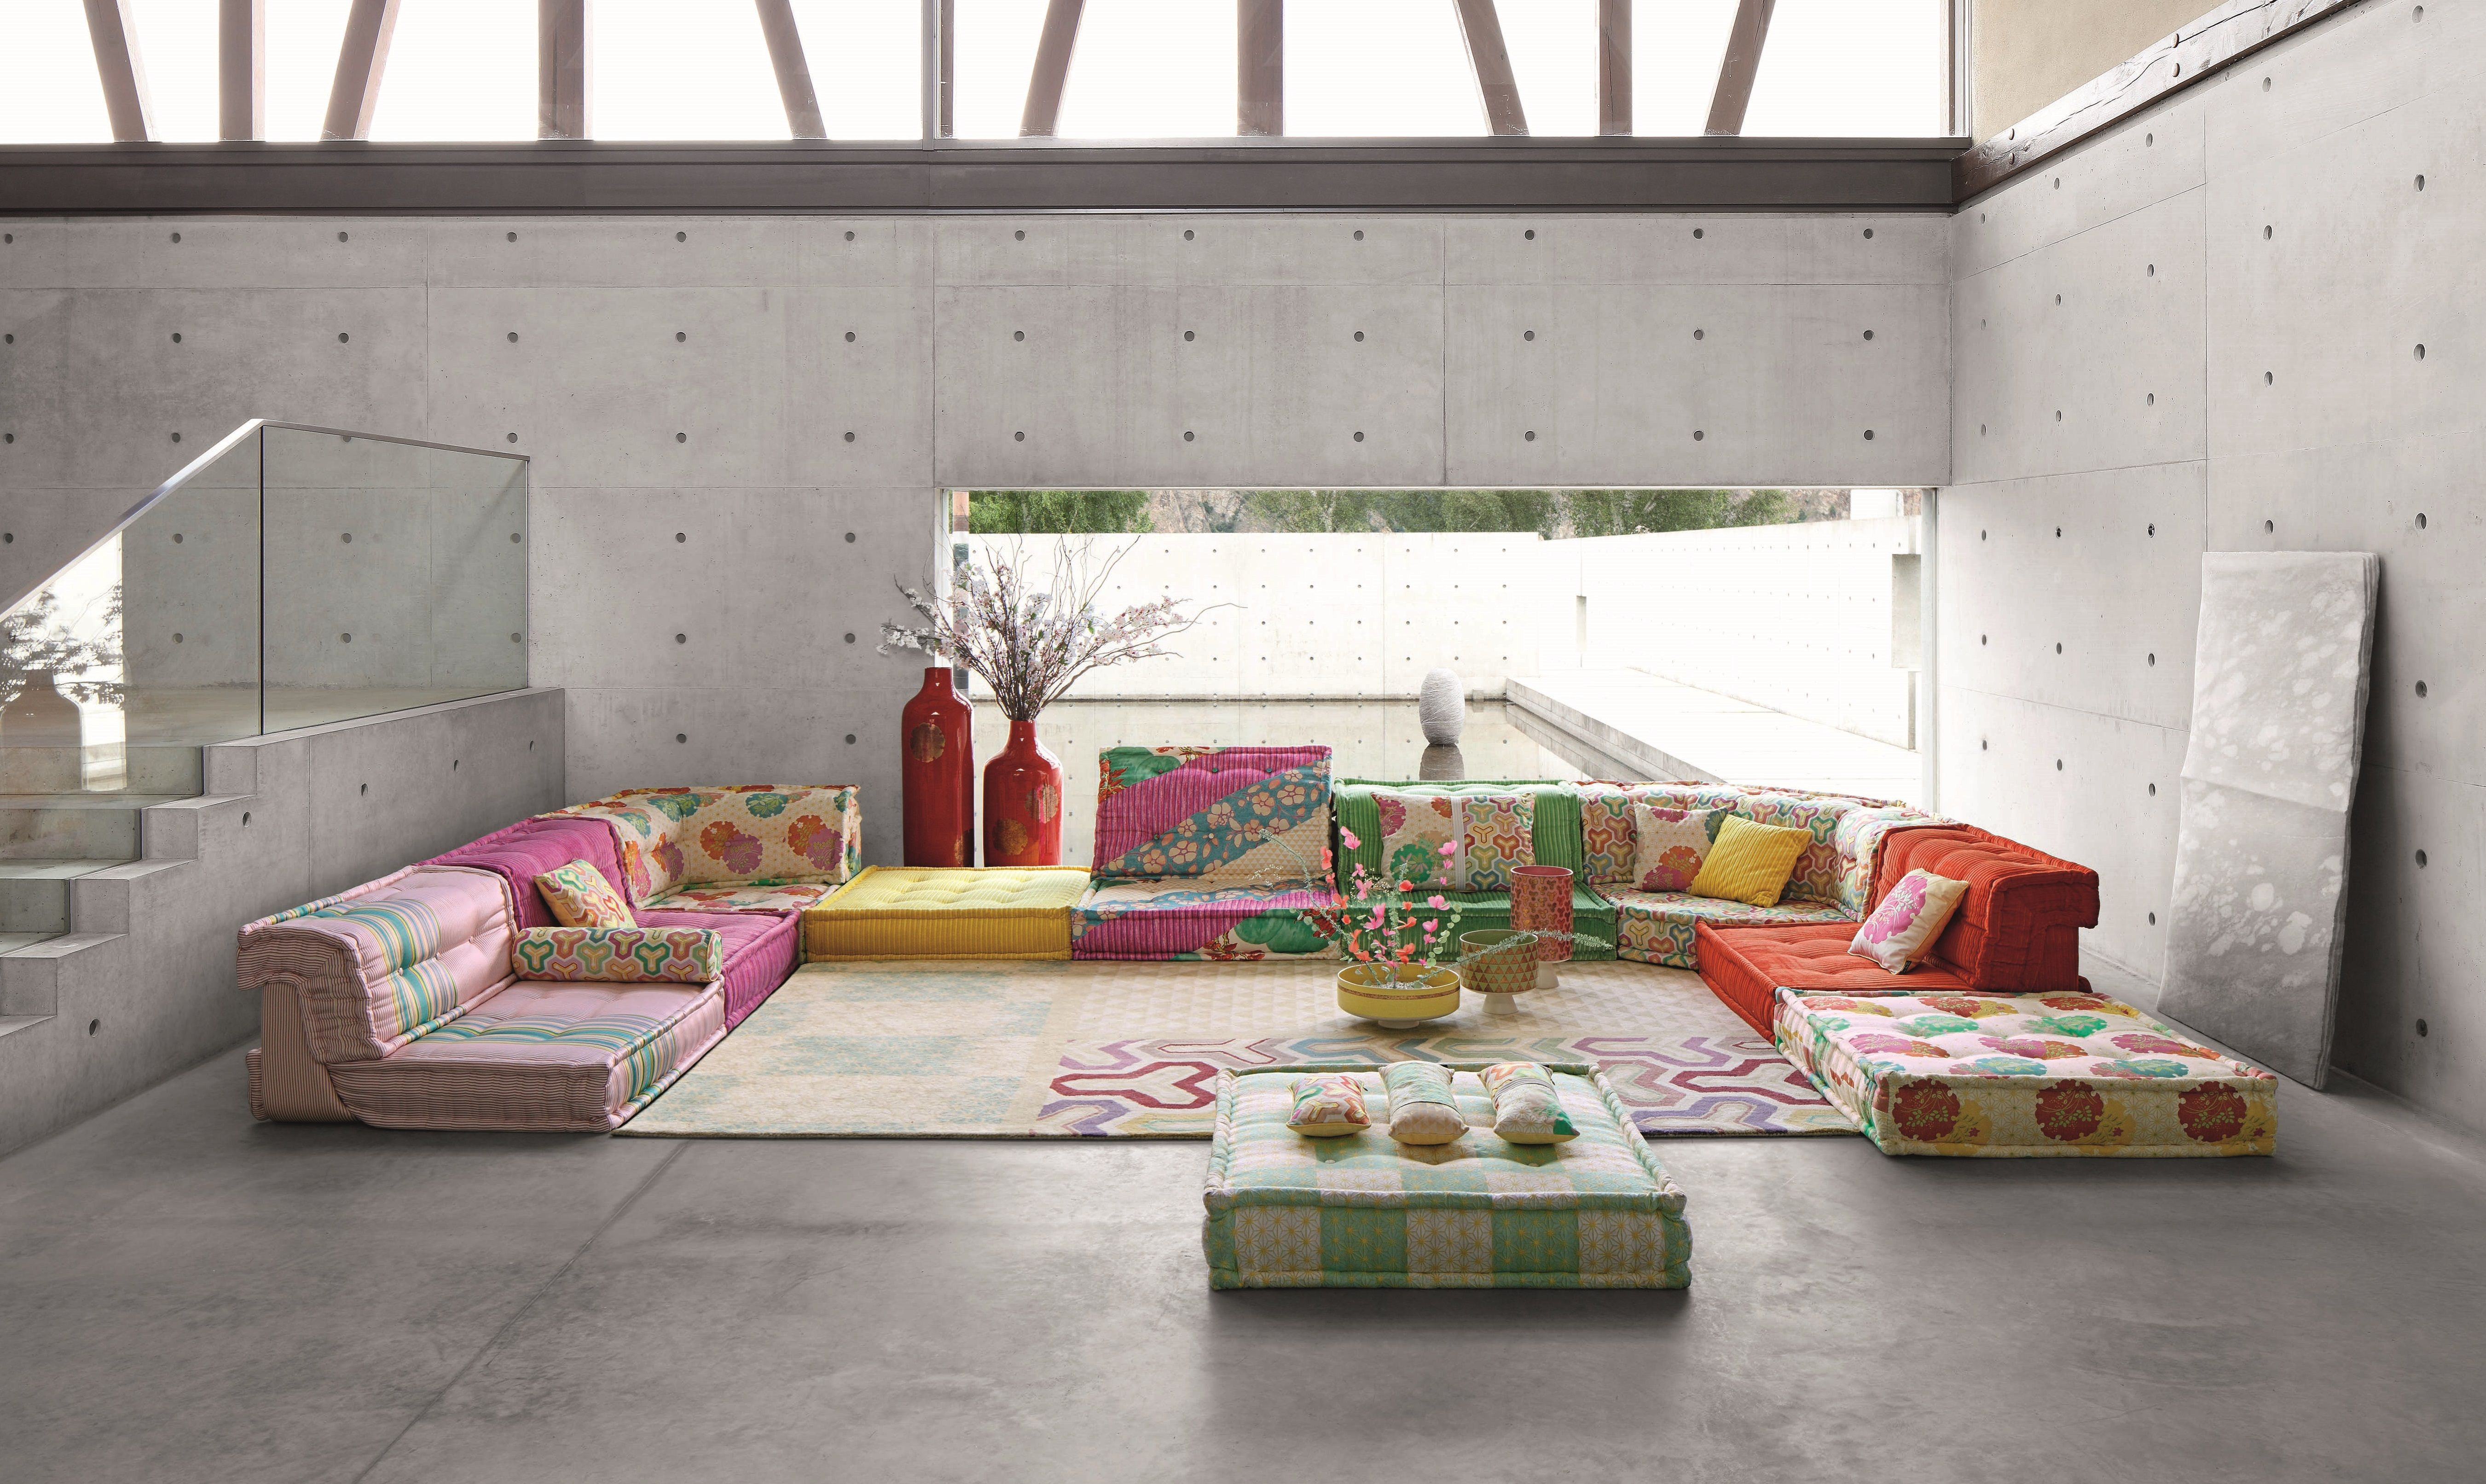 Roche Bobois Mah Jong Composition Asa Designed By Hans Hopfer In Fabric Designed By Kenzo European Home Decor Contemporary Furniture Contemporary Interior